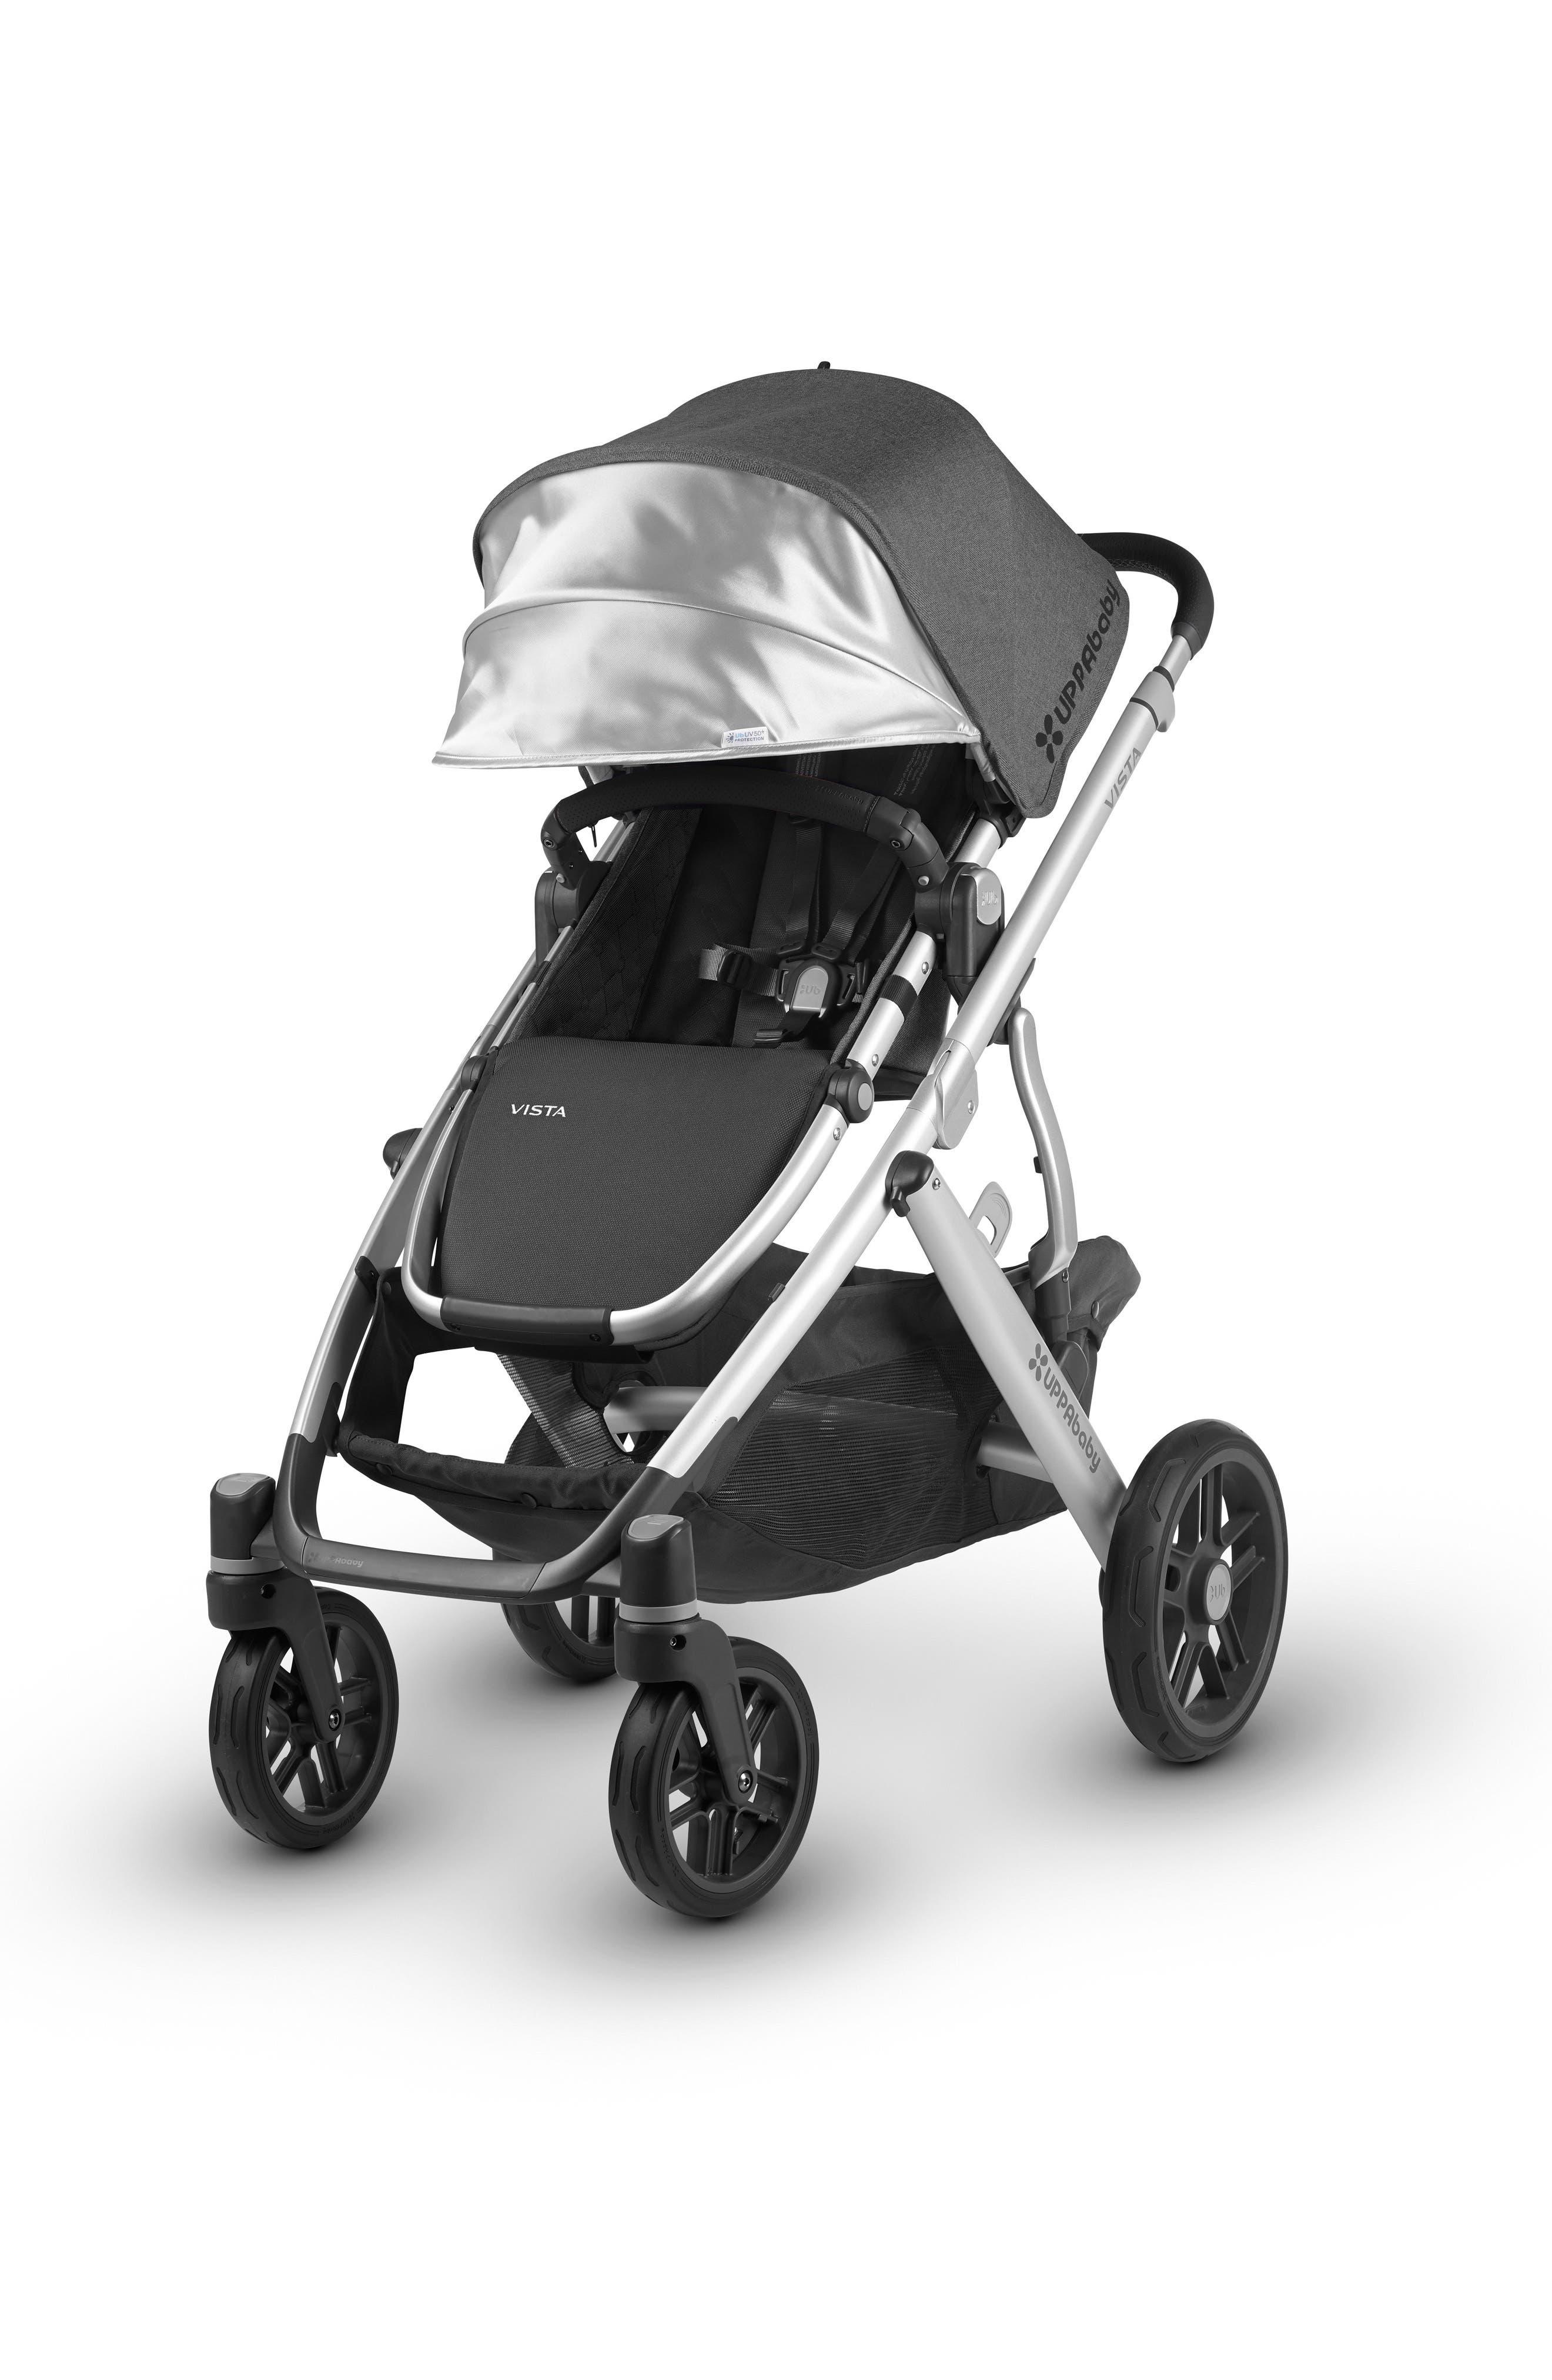 2018 VISTA Aluminum Frame Convertible Complete Stroller with Leather Trim,                             Alternate thumbnail 3, color,                             Jordan Charcoal/ Silver